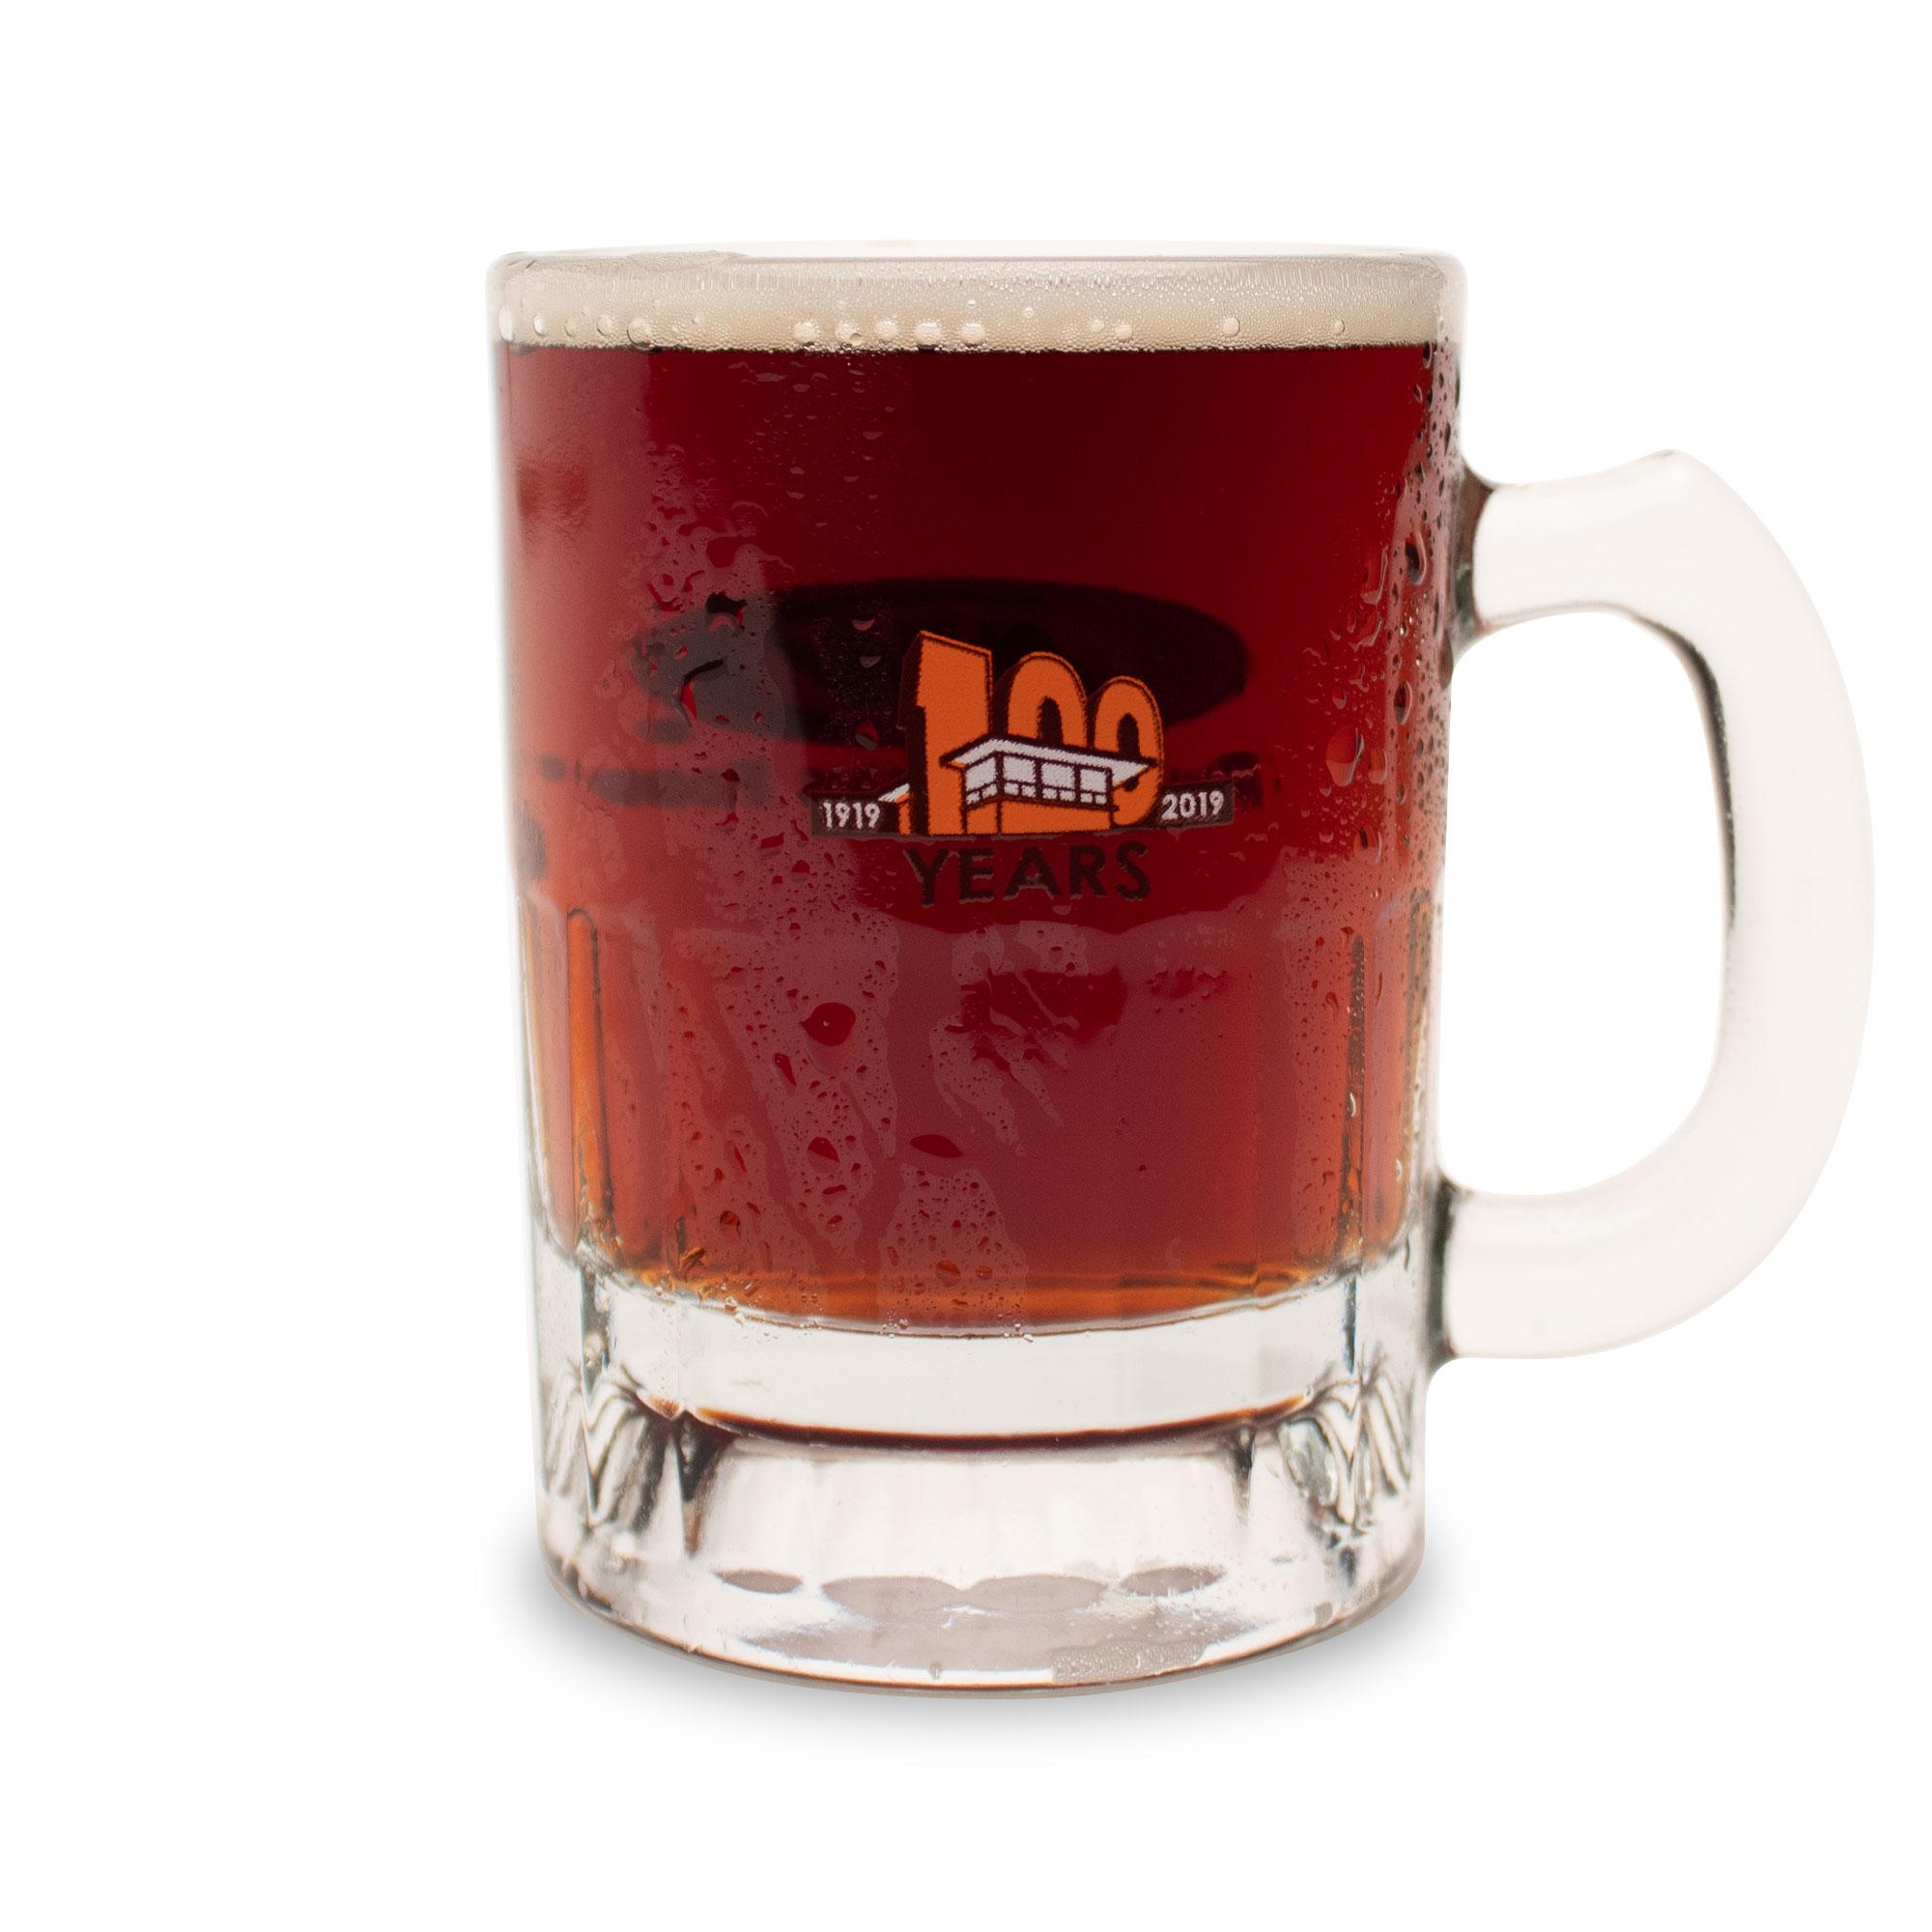 A&W Baby Mug featuring 100th Anniversary logo